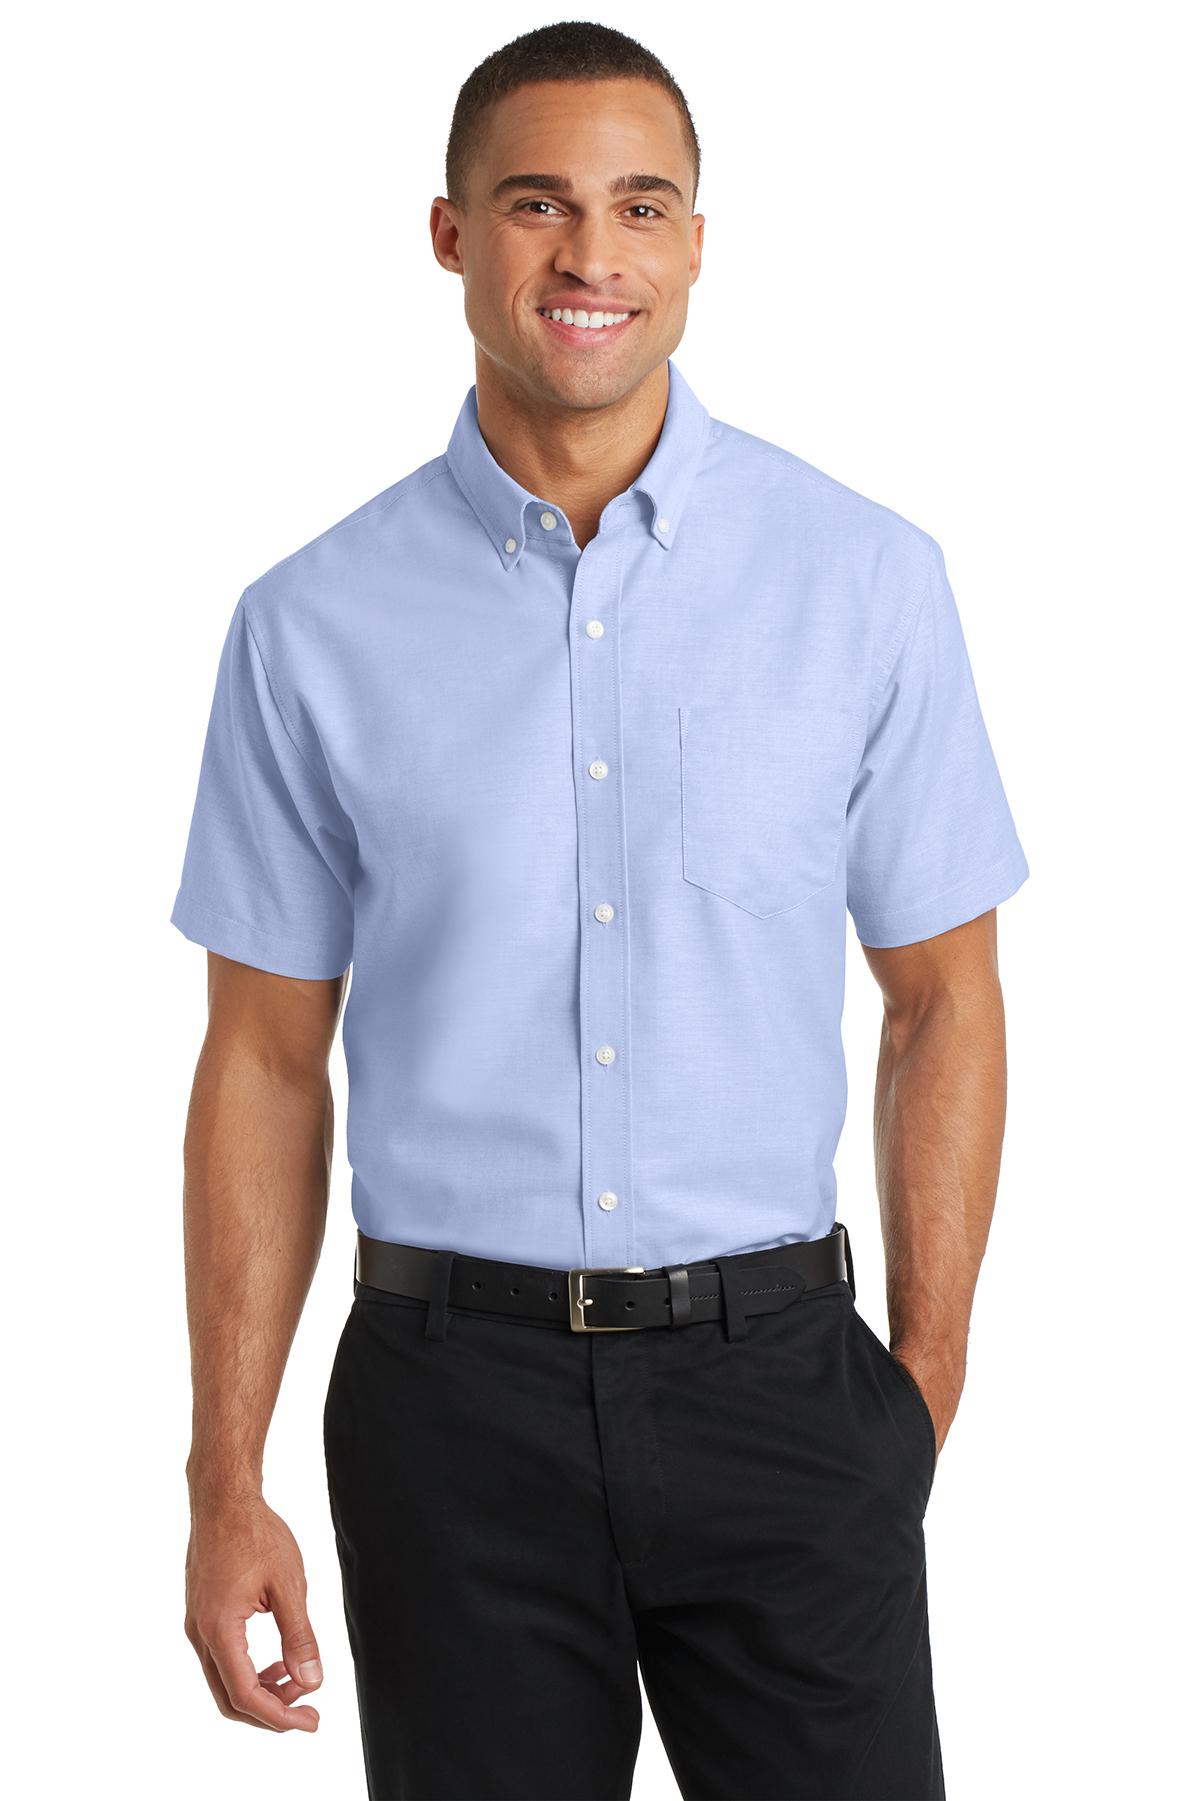 9d8ba6ea8 Port Authority® Short Sleeve SuperPro™ Oxford Shirt | Oxfords ...